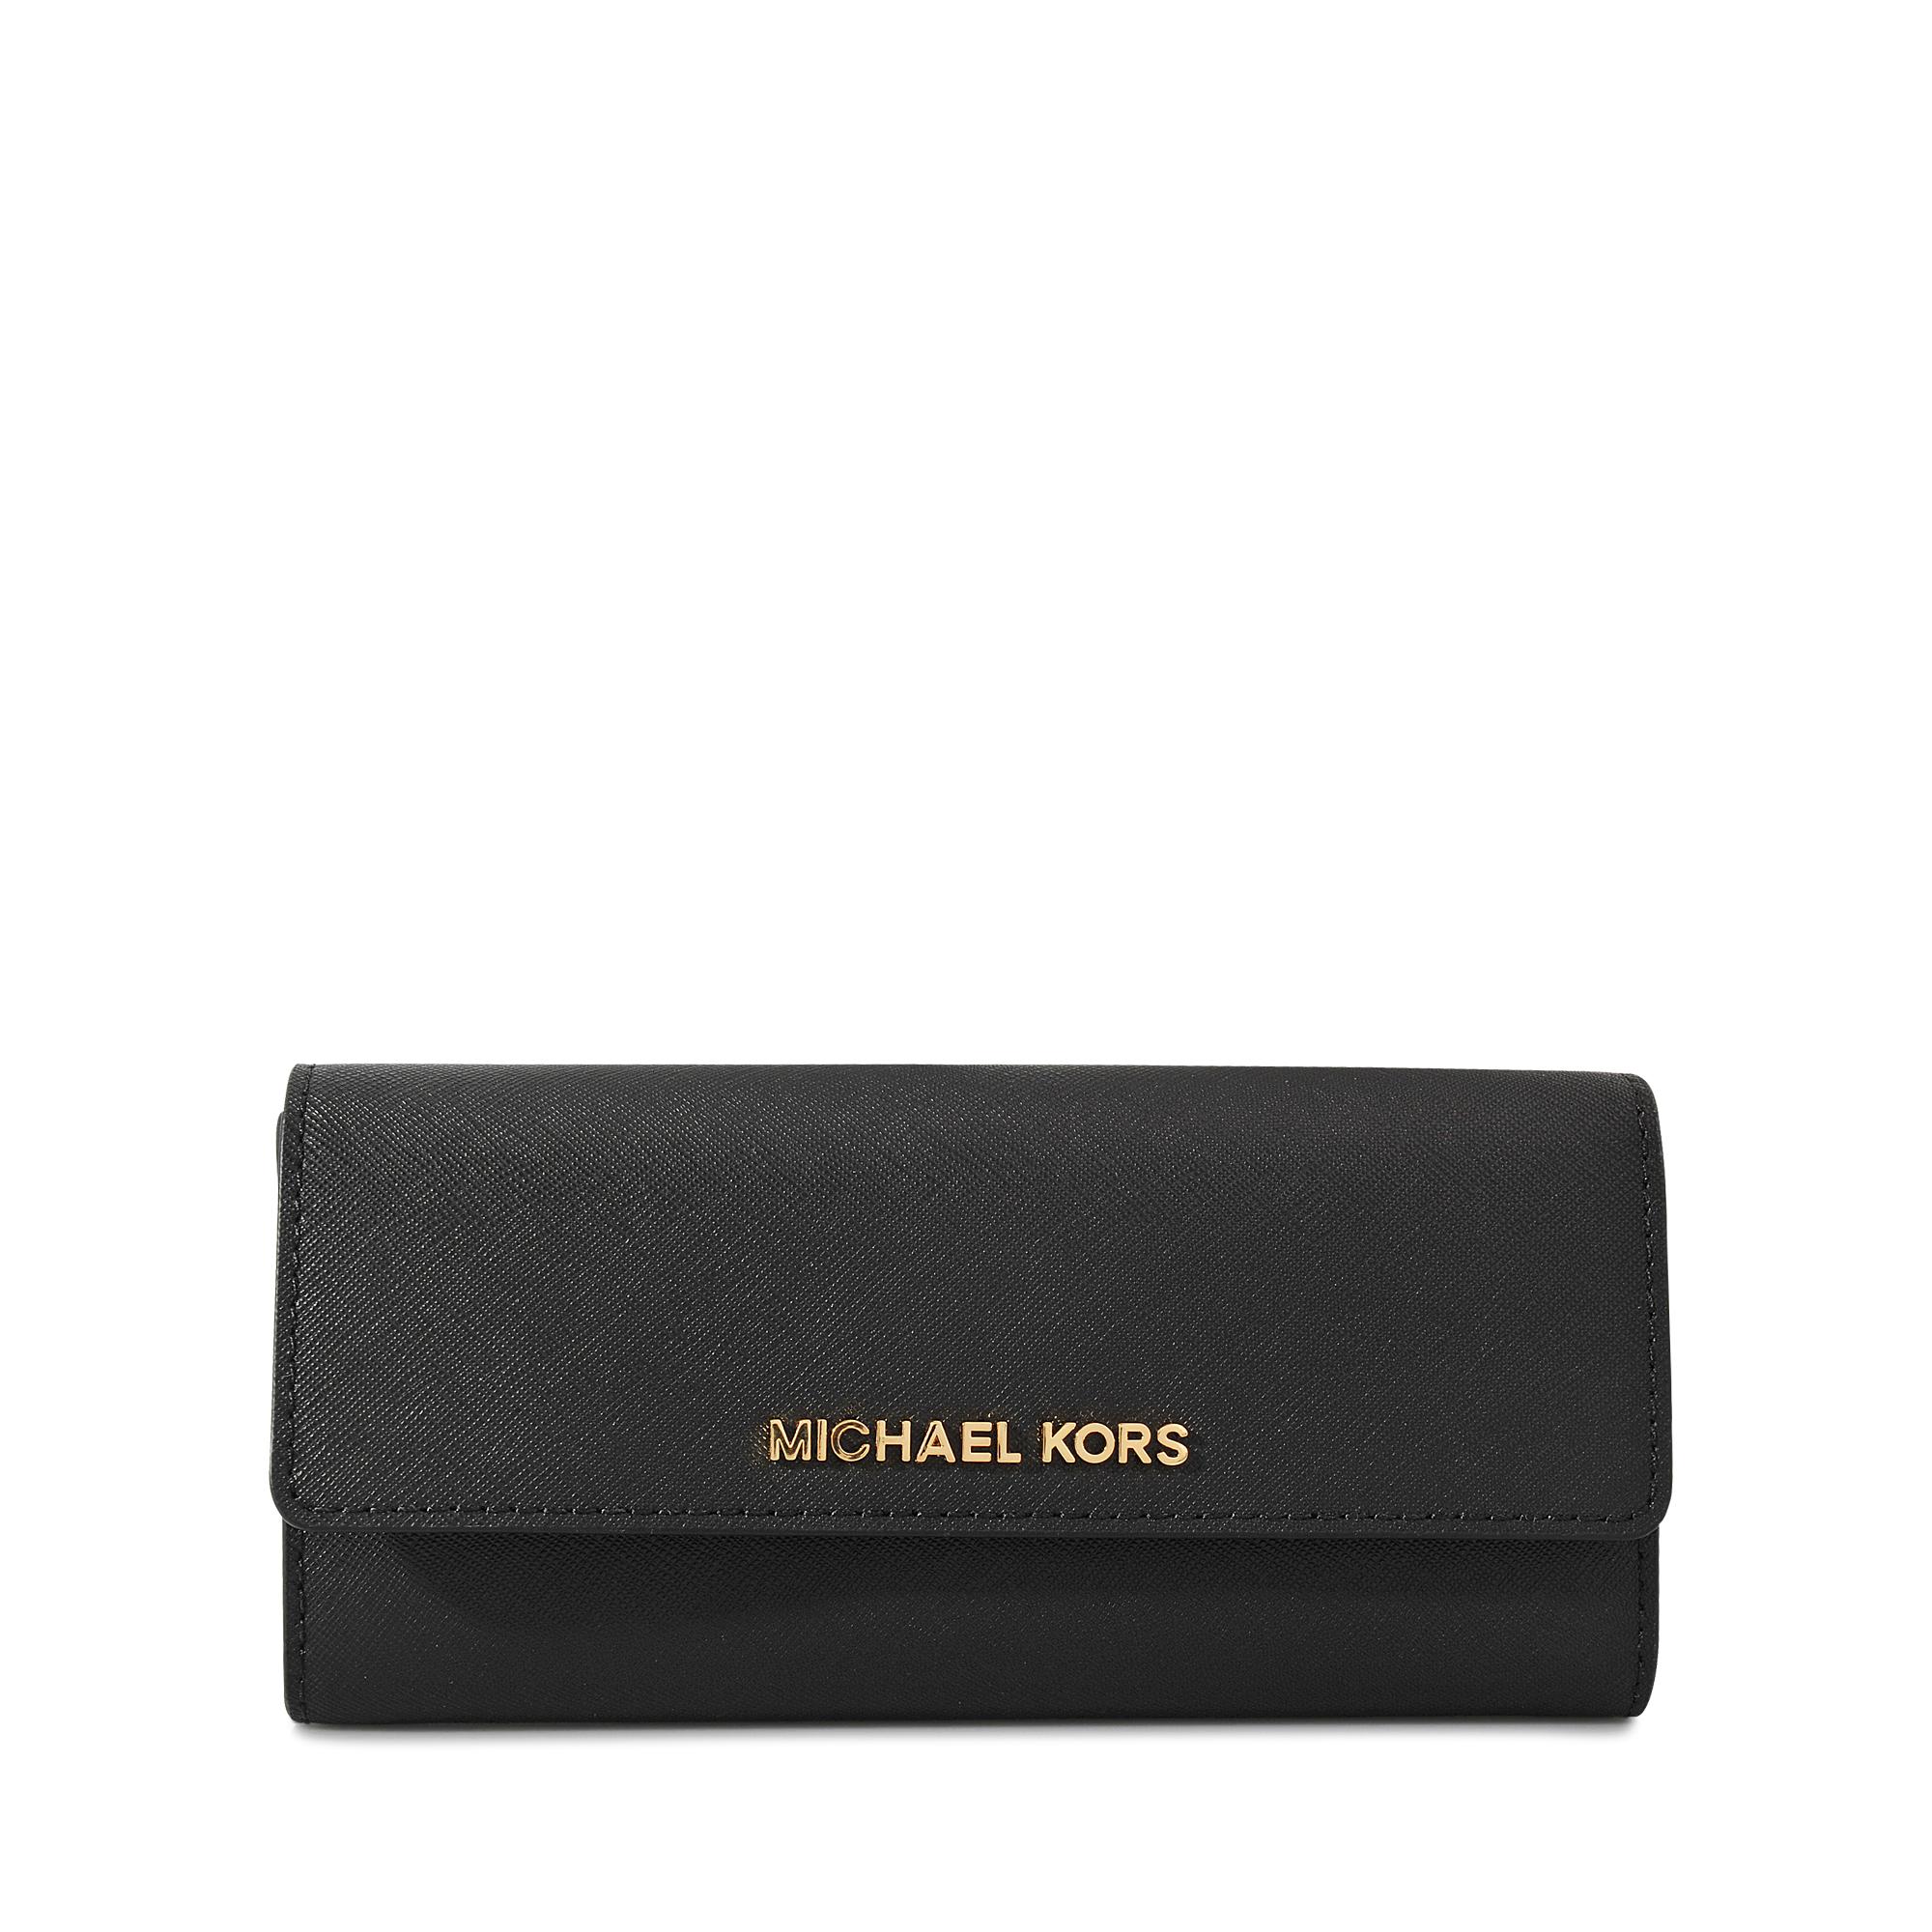 a0ca07f096f5 Michael Kors Jet Set Travel Lg Flap Carryall Wallet in Black - Lyst